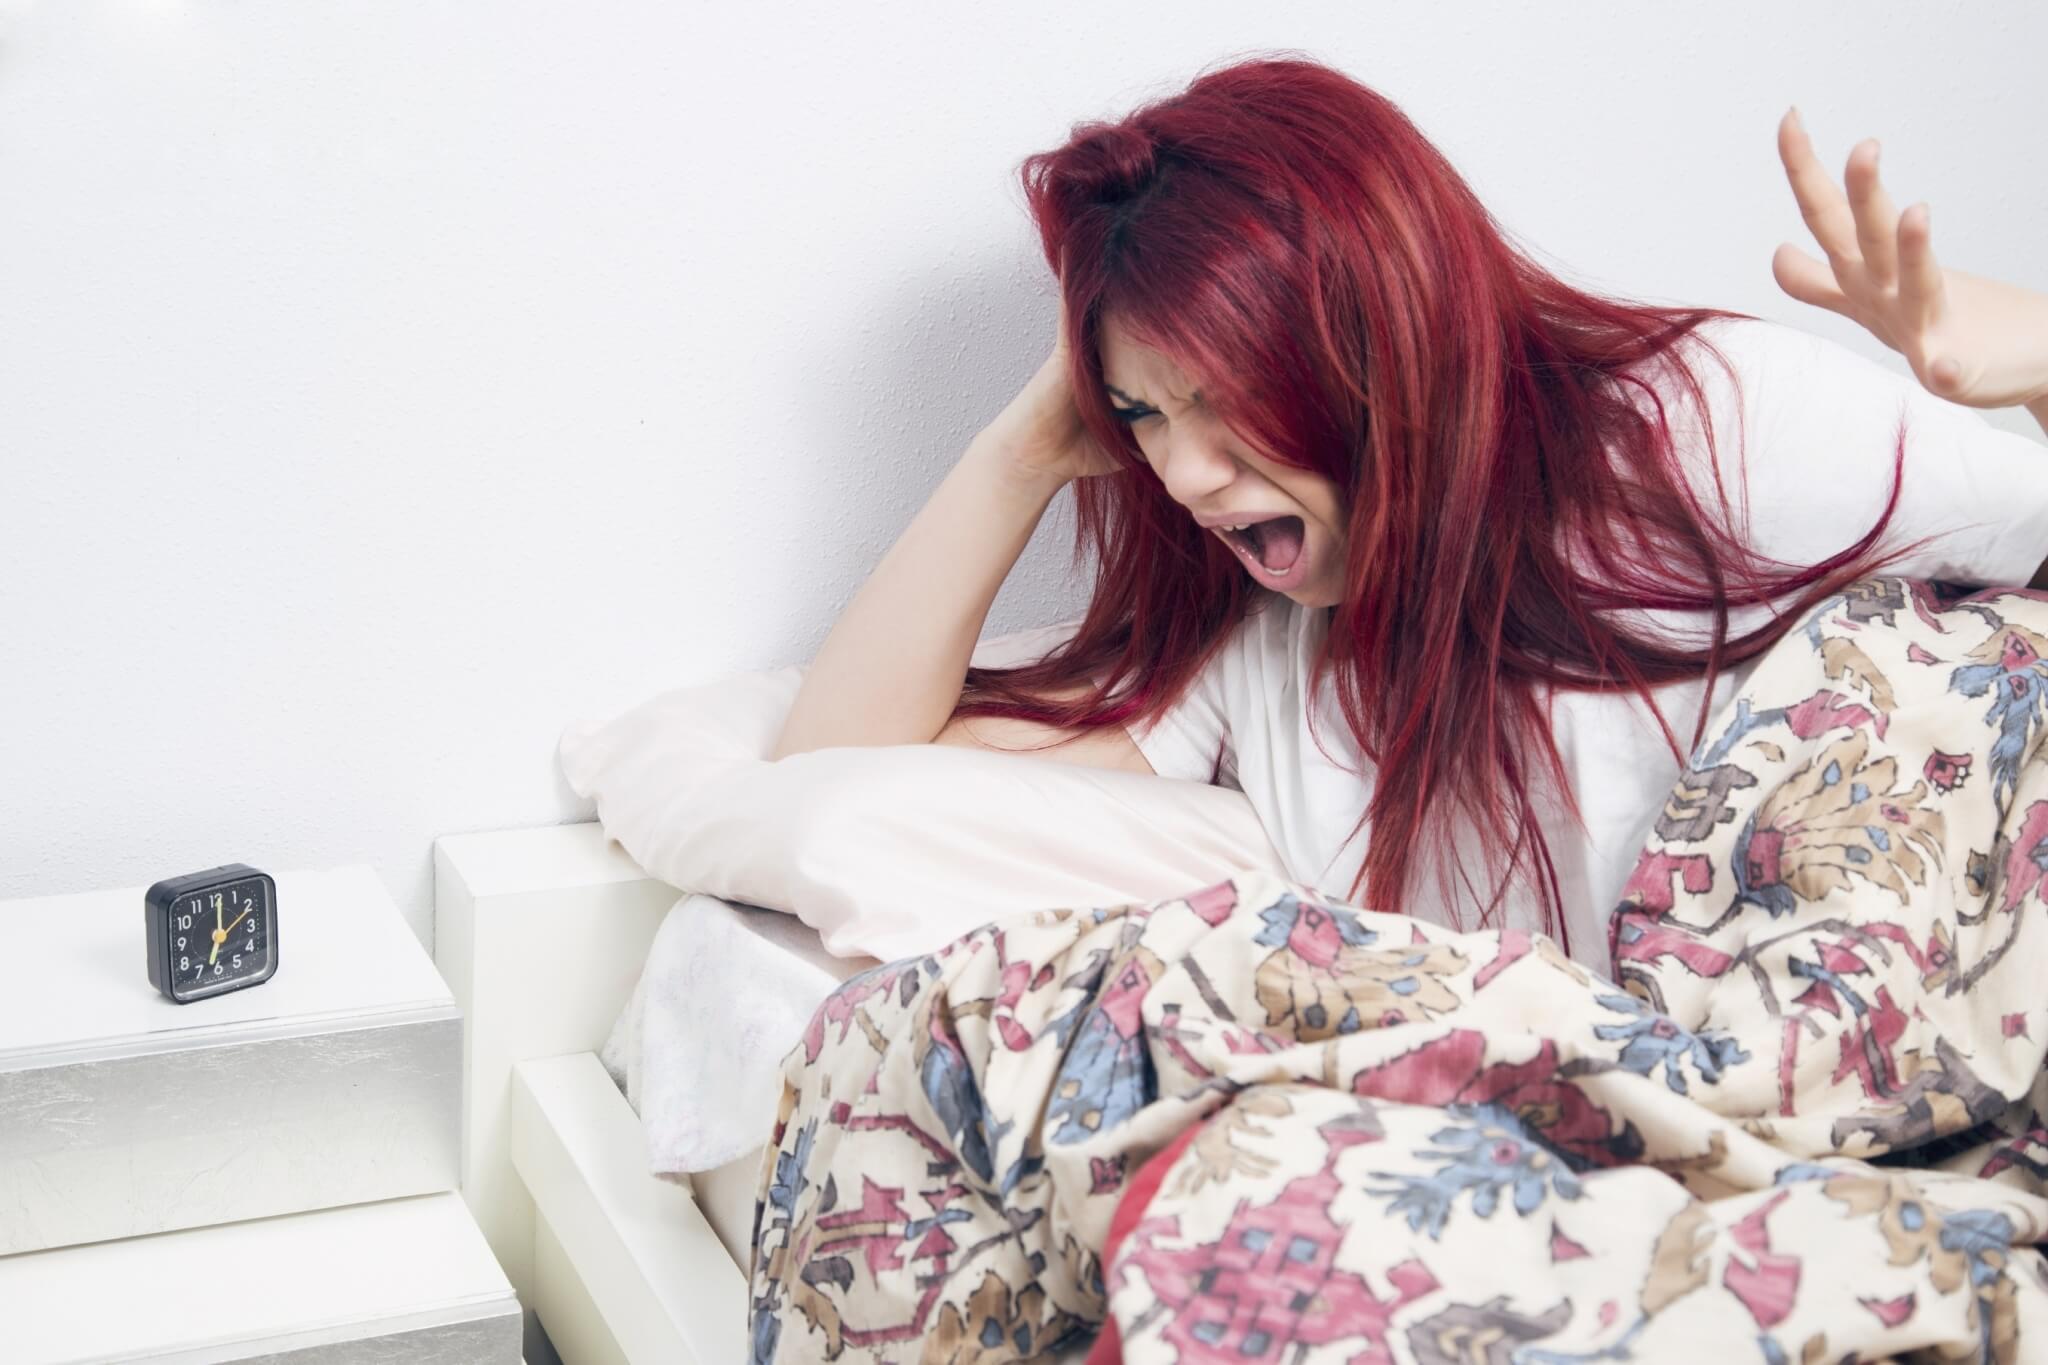 Angry-woman-waking-up-lying-on-the-bed-awake-000088092593_Large.jpg.jpeg